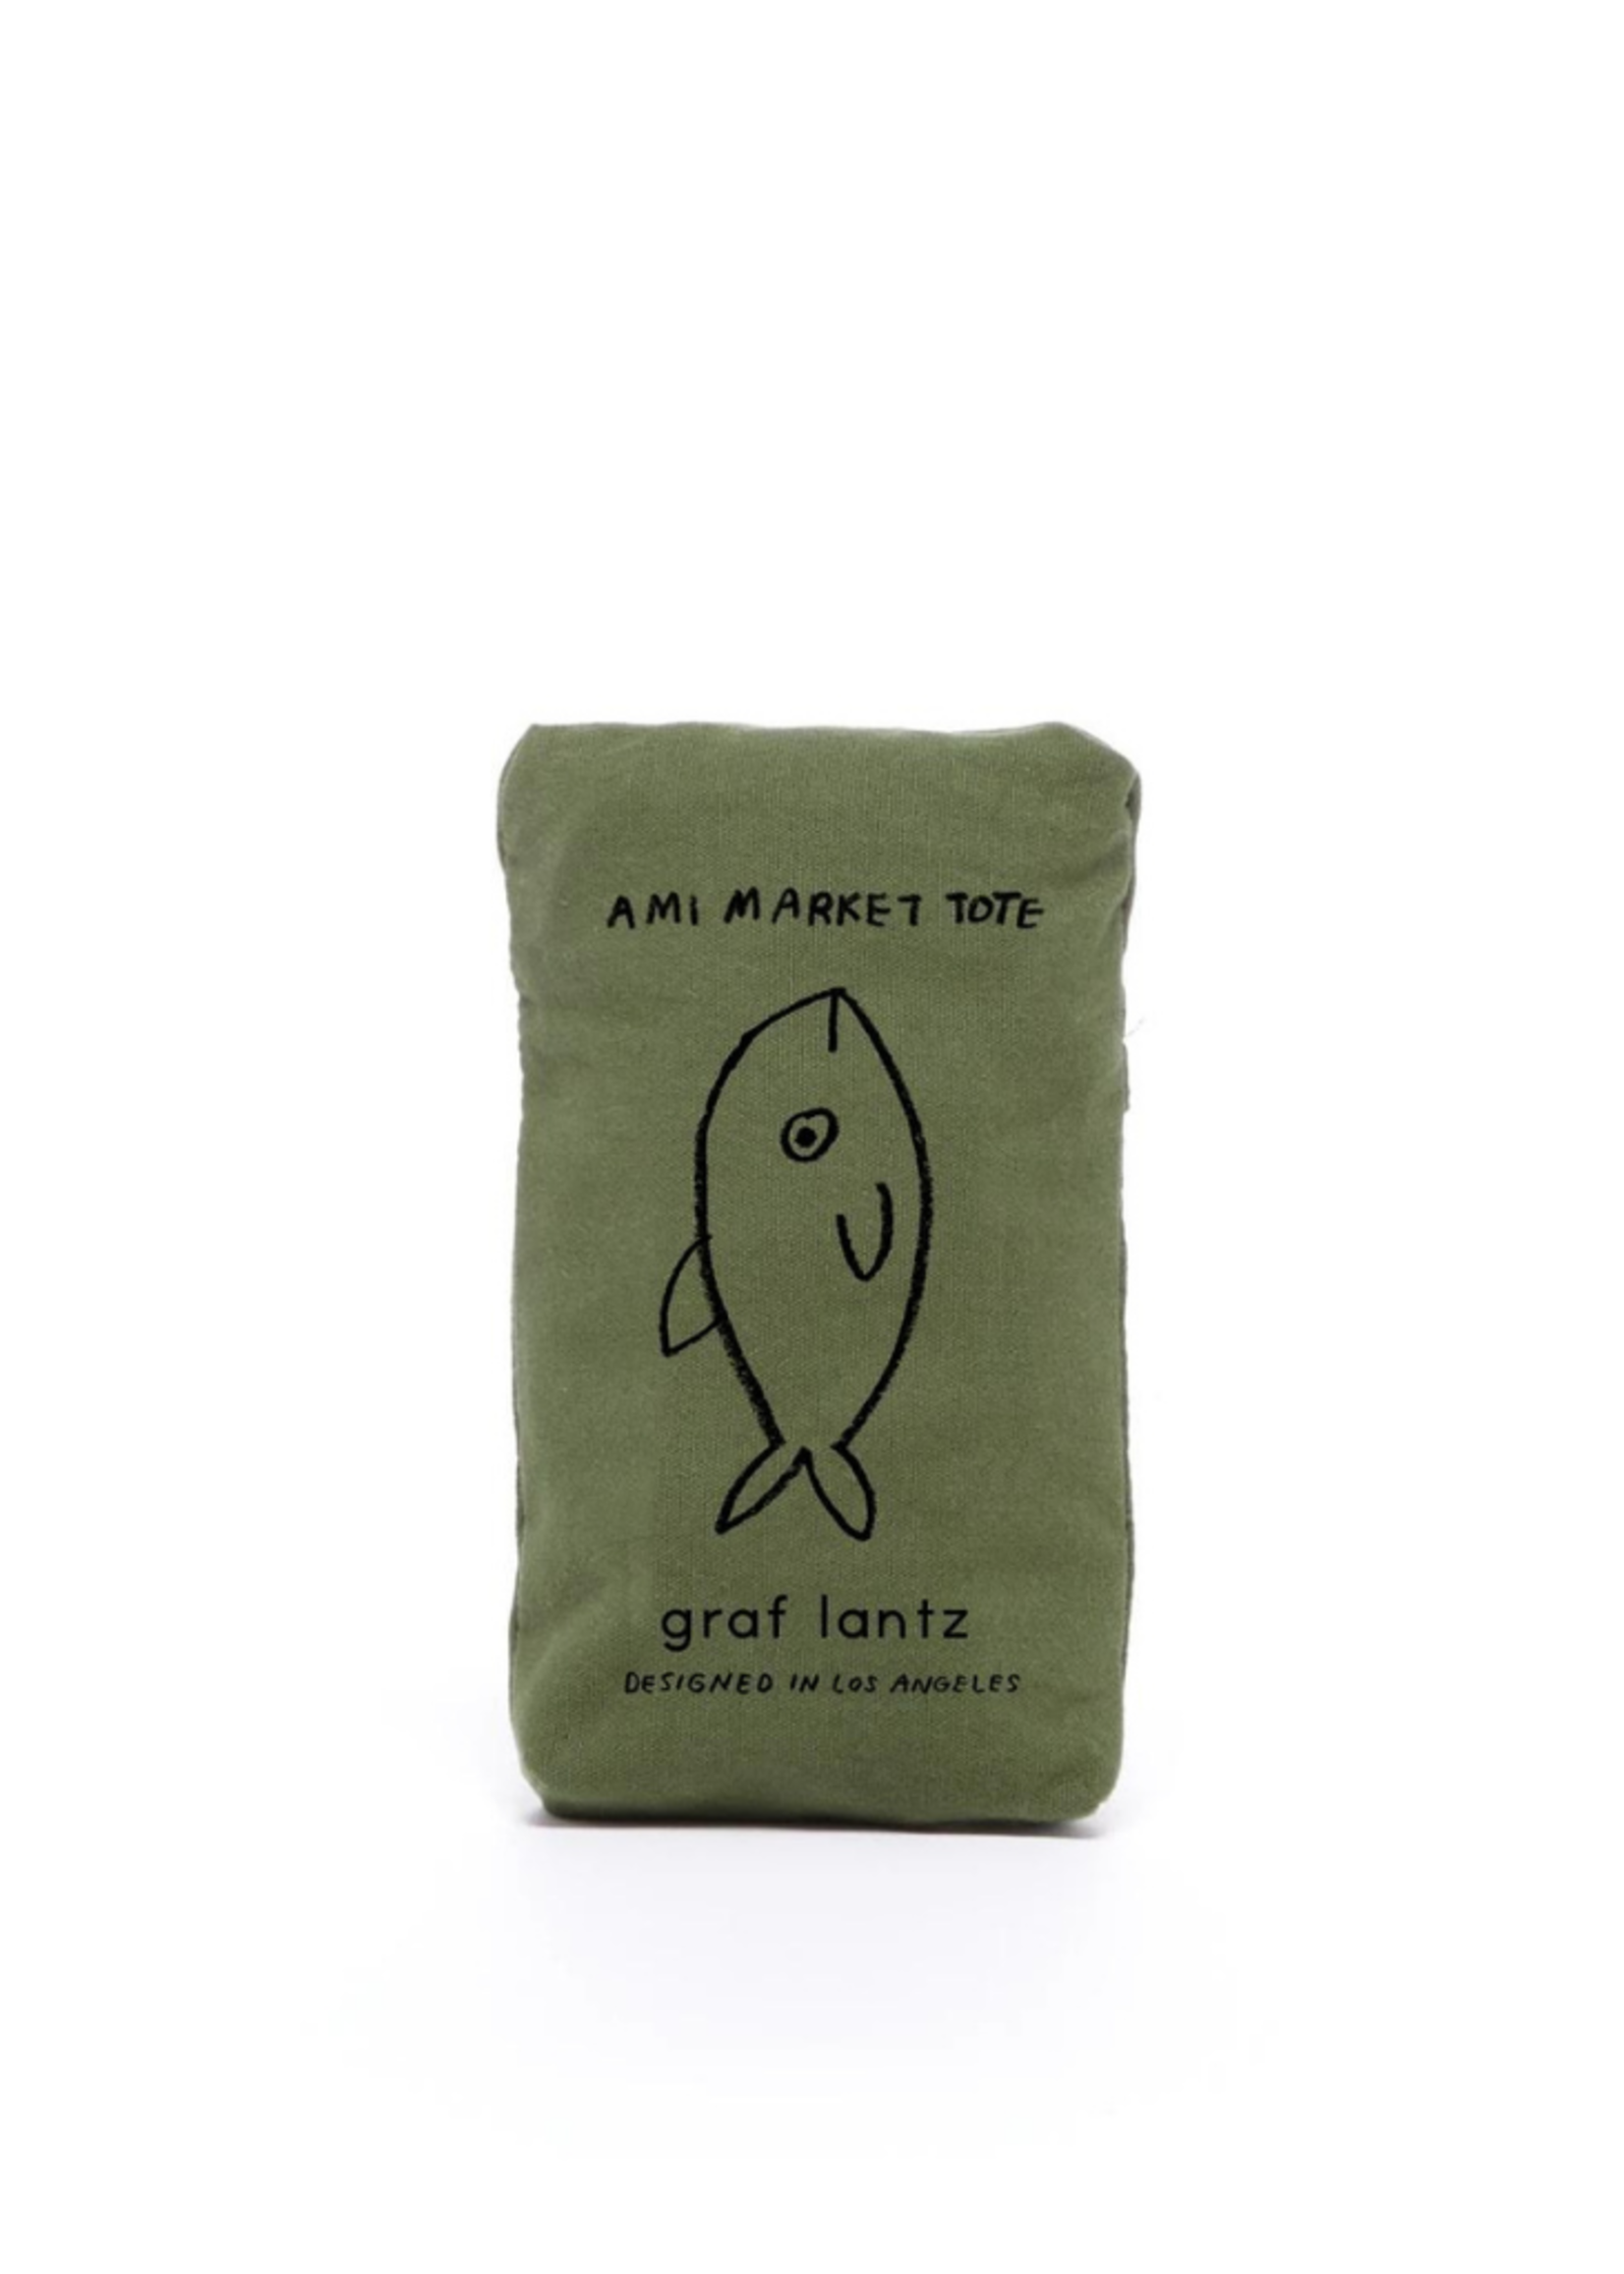 Graf&Lantz Ami Net Market Tote Army